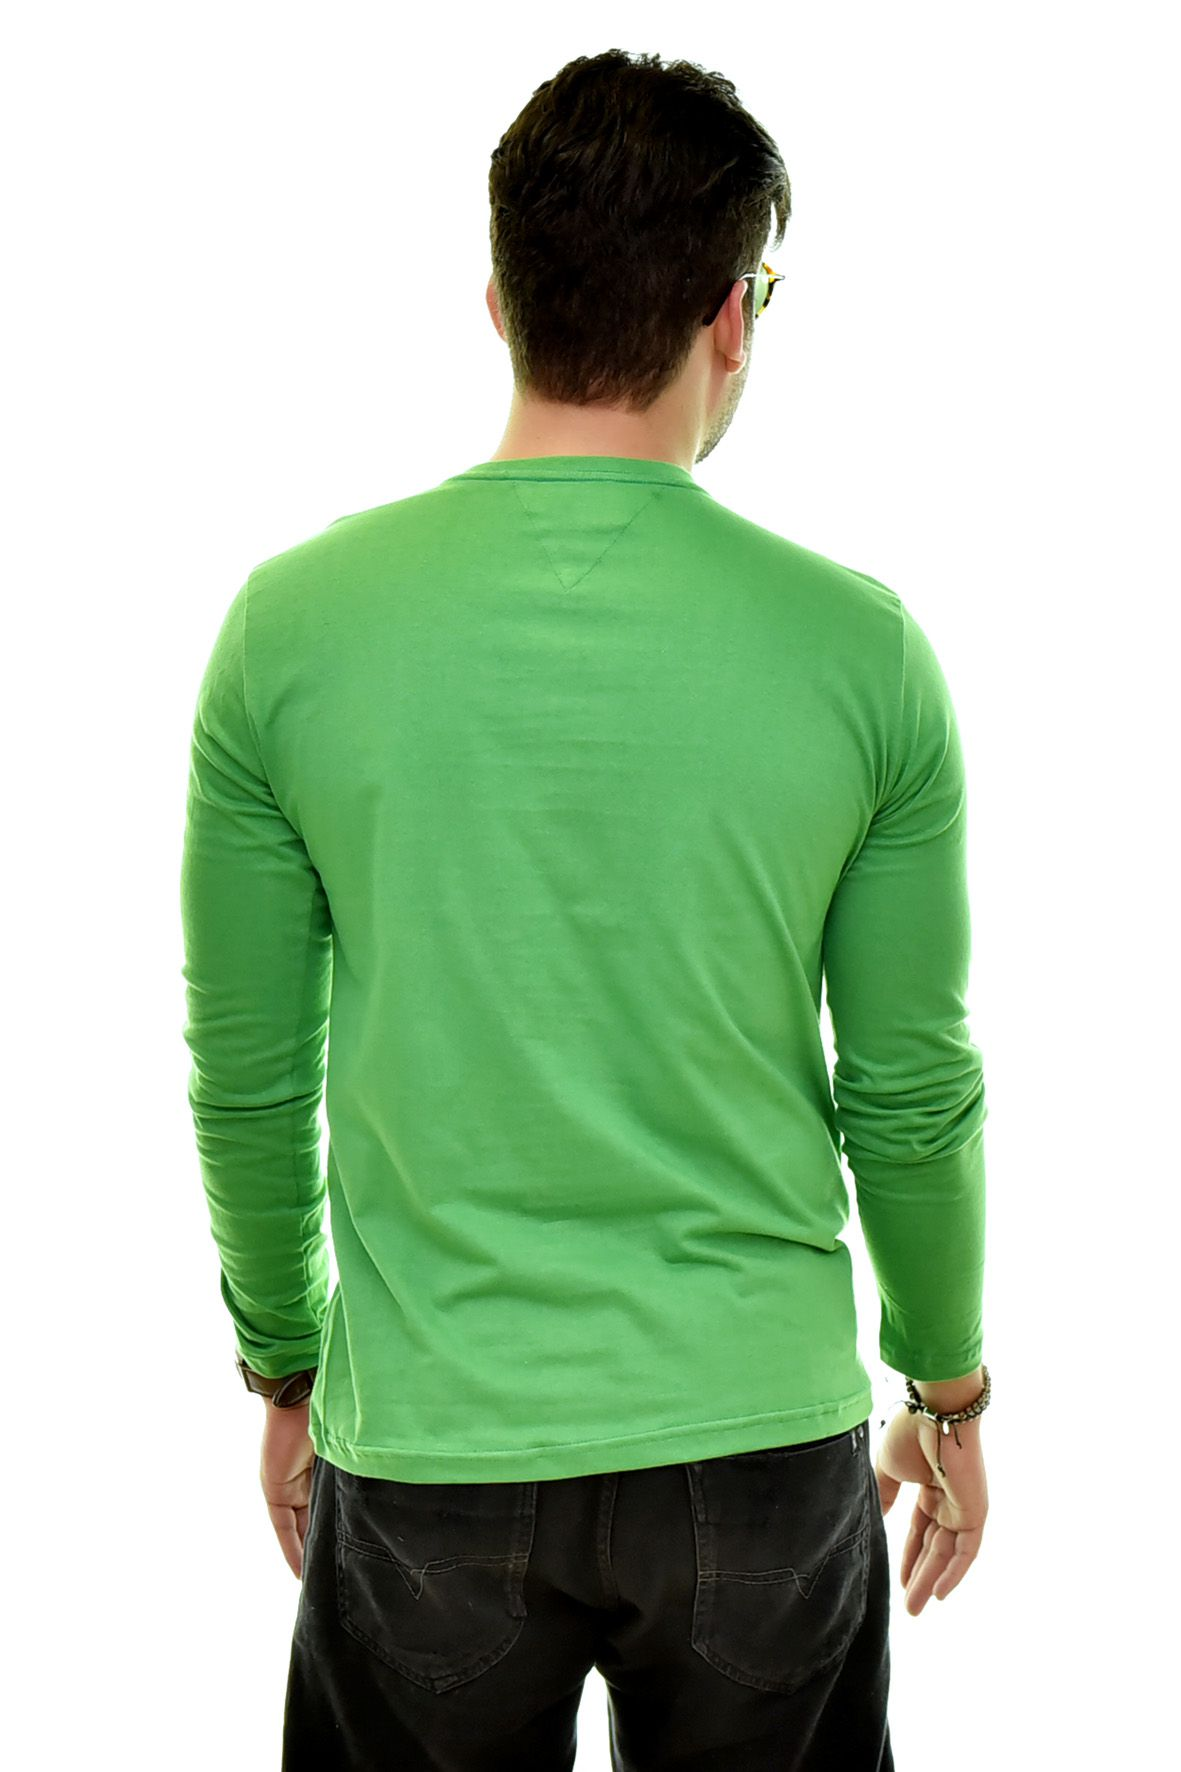 Camiseta TH Manga Longa Verde   - Ca Brasileira